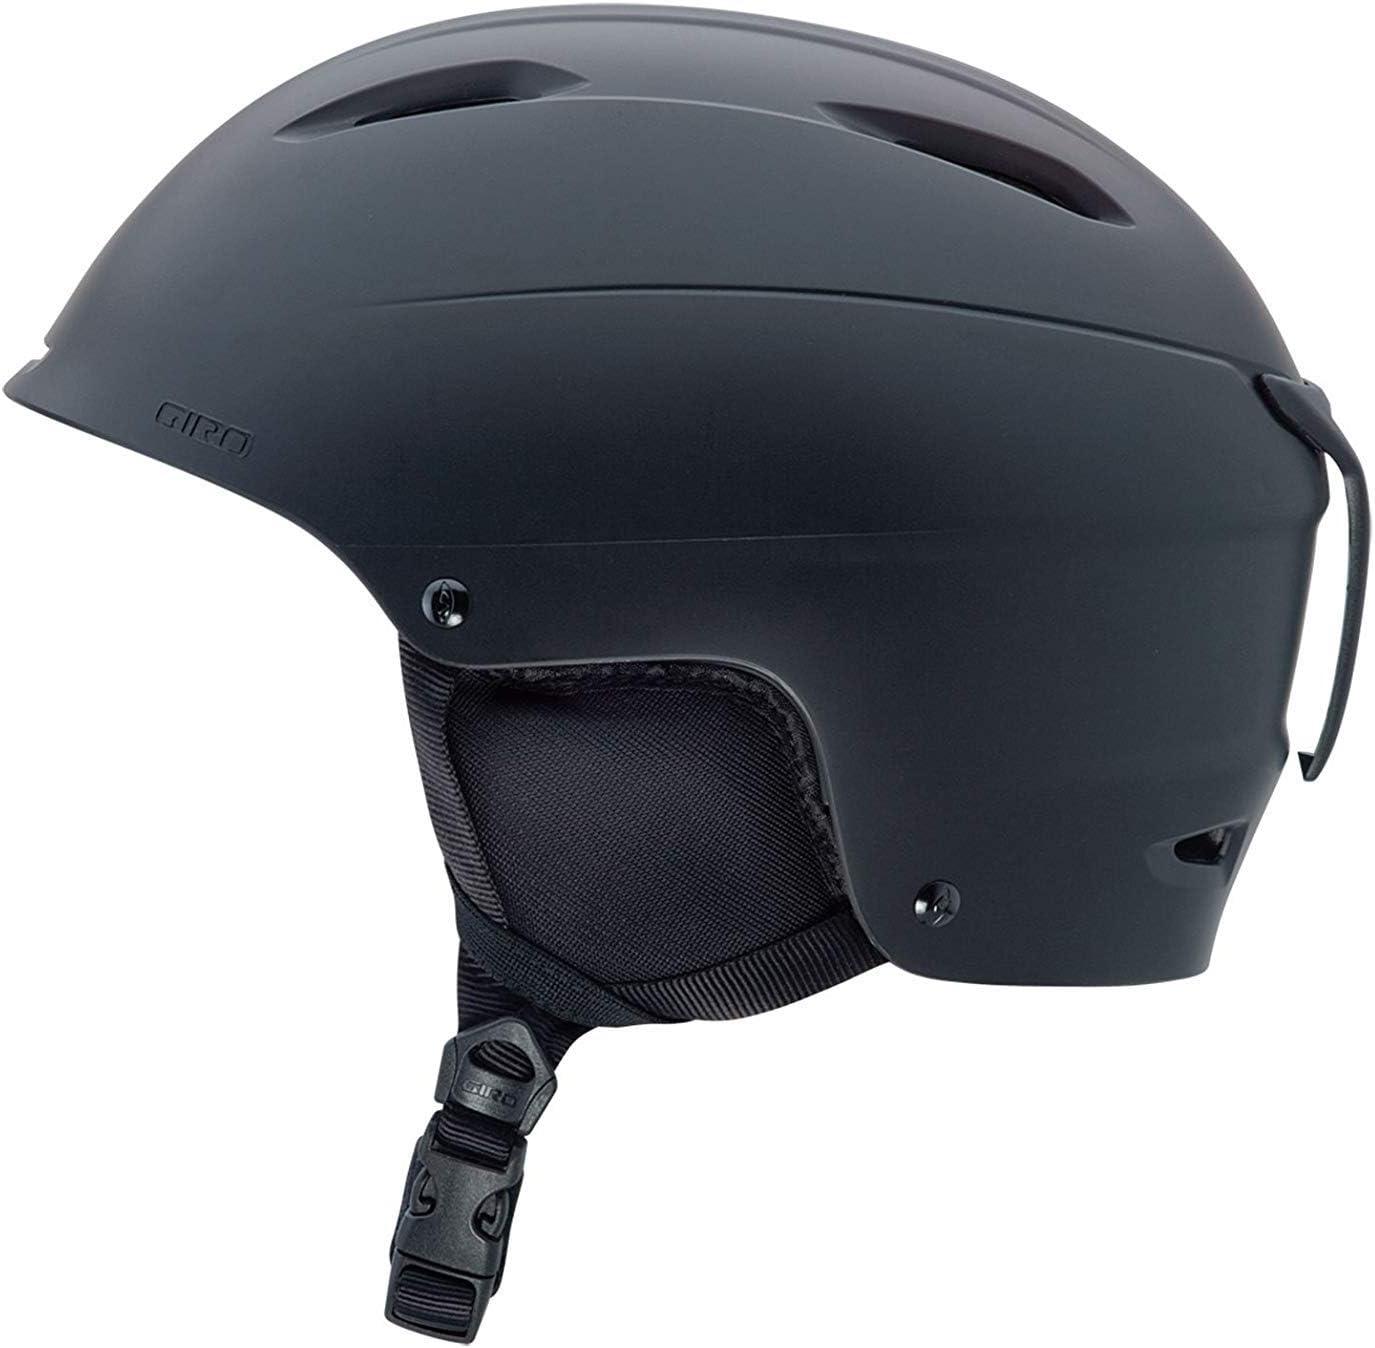 Giro Bevel Snowboard Helmet 今季も再入荷 Black Matte Mens 無料